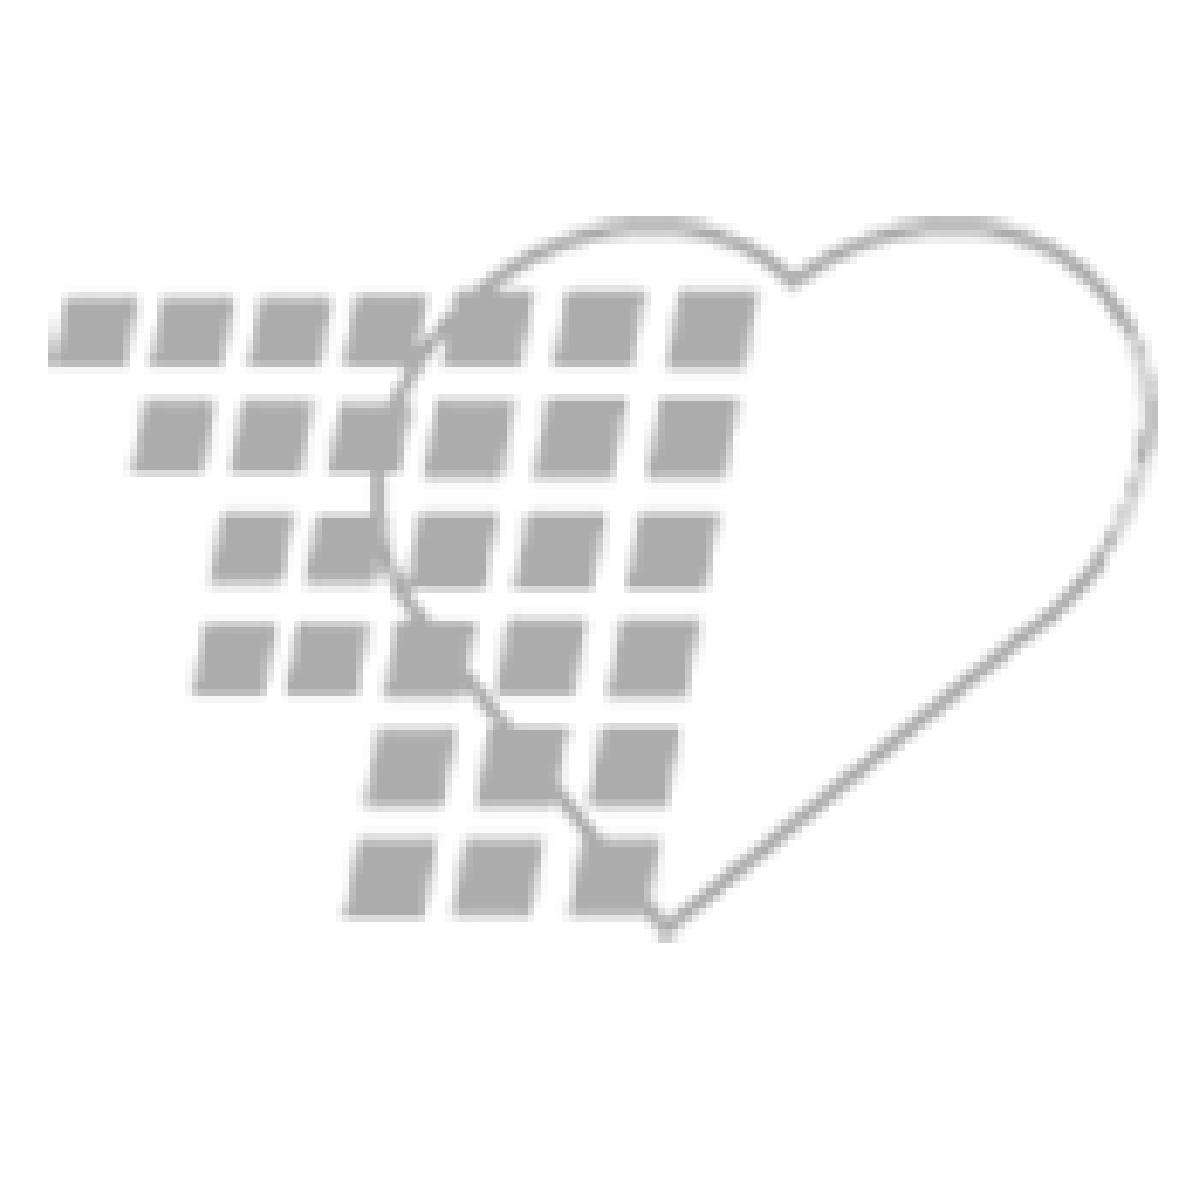 06-93-0723 Demo Dose® Temazepm (Restorl) 15mg - 100 Pills/Box